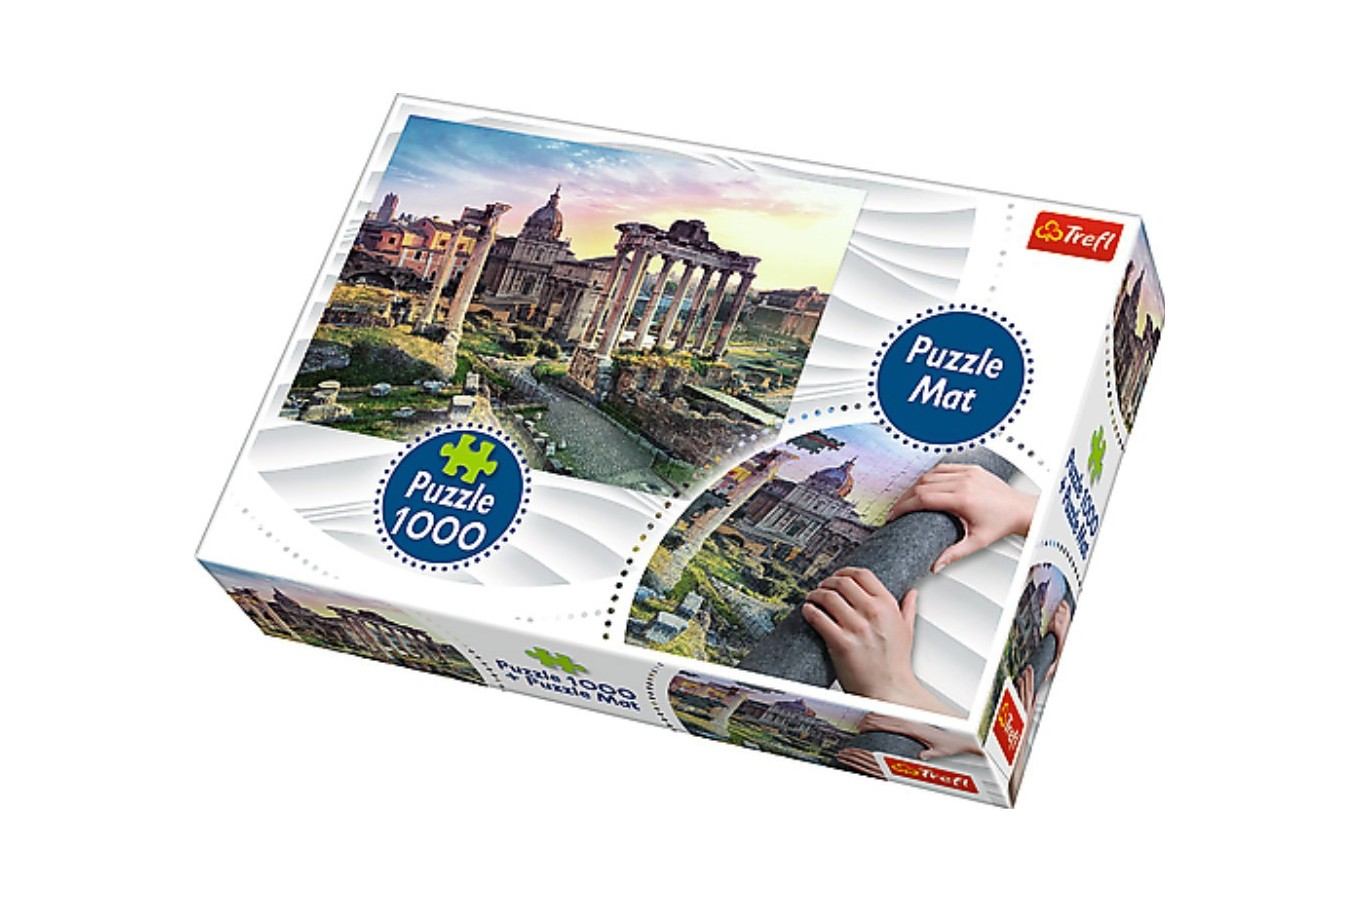 Puzzle Trefl - Italia, 1000 piese, include covor pentru rulat puzzle (90723)